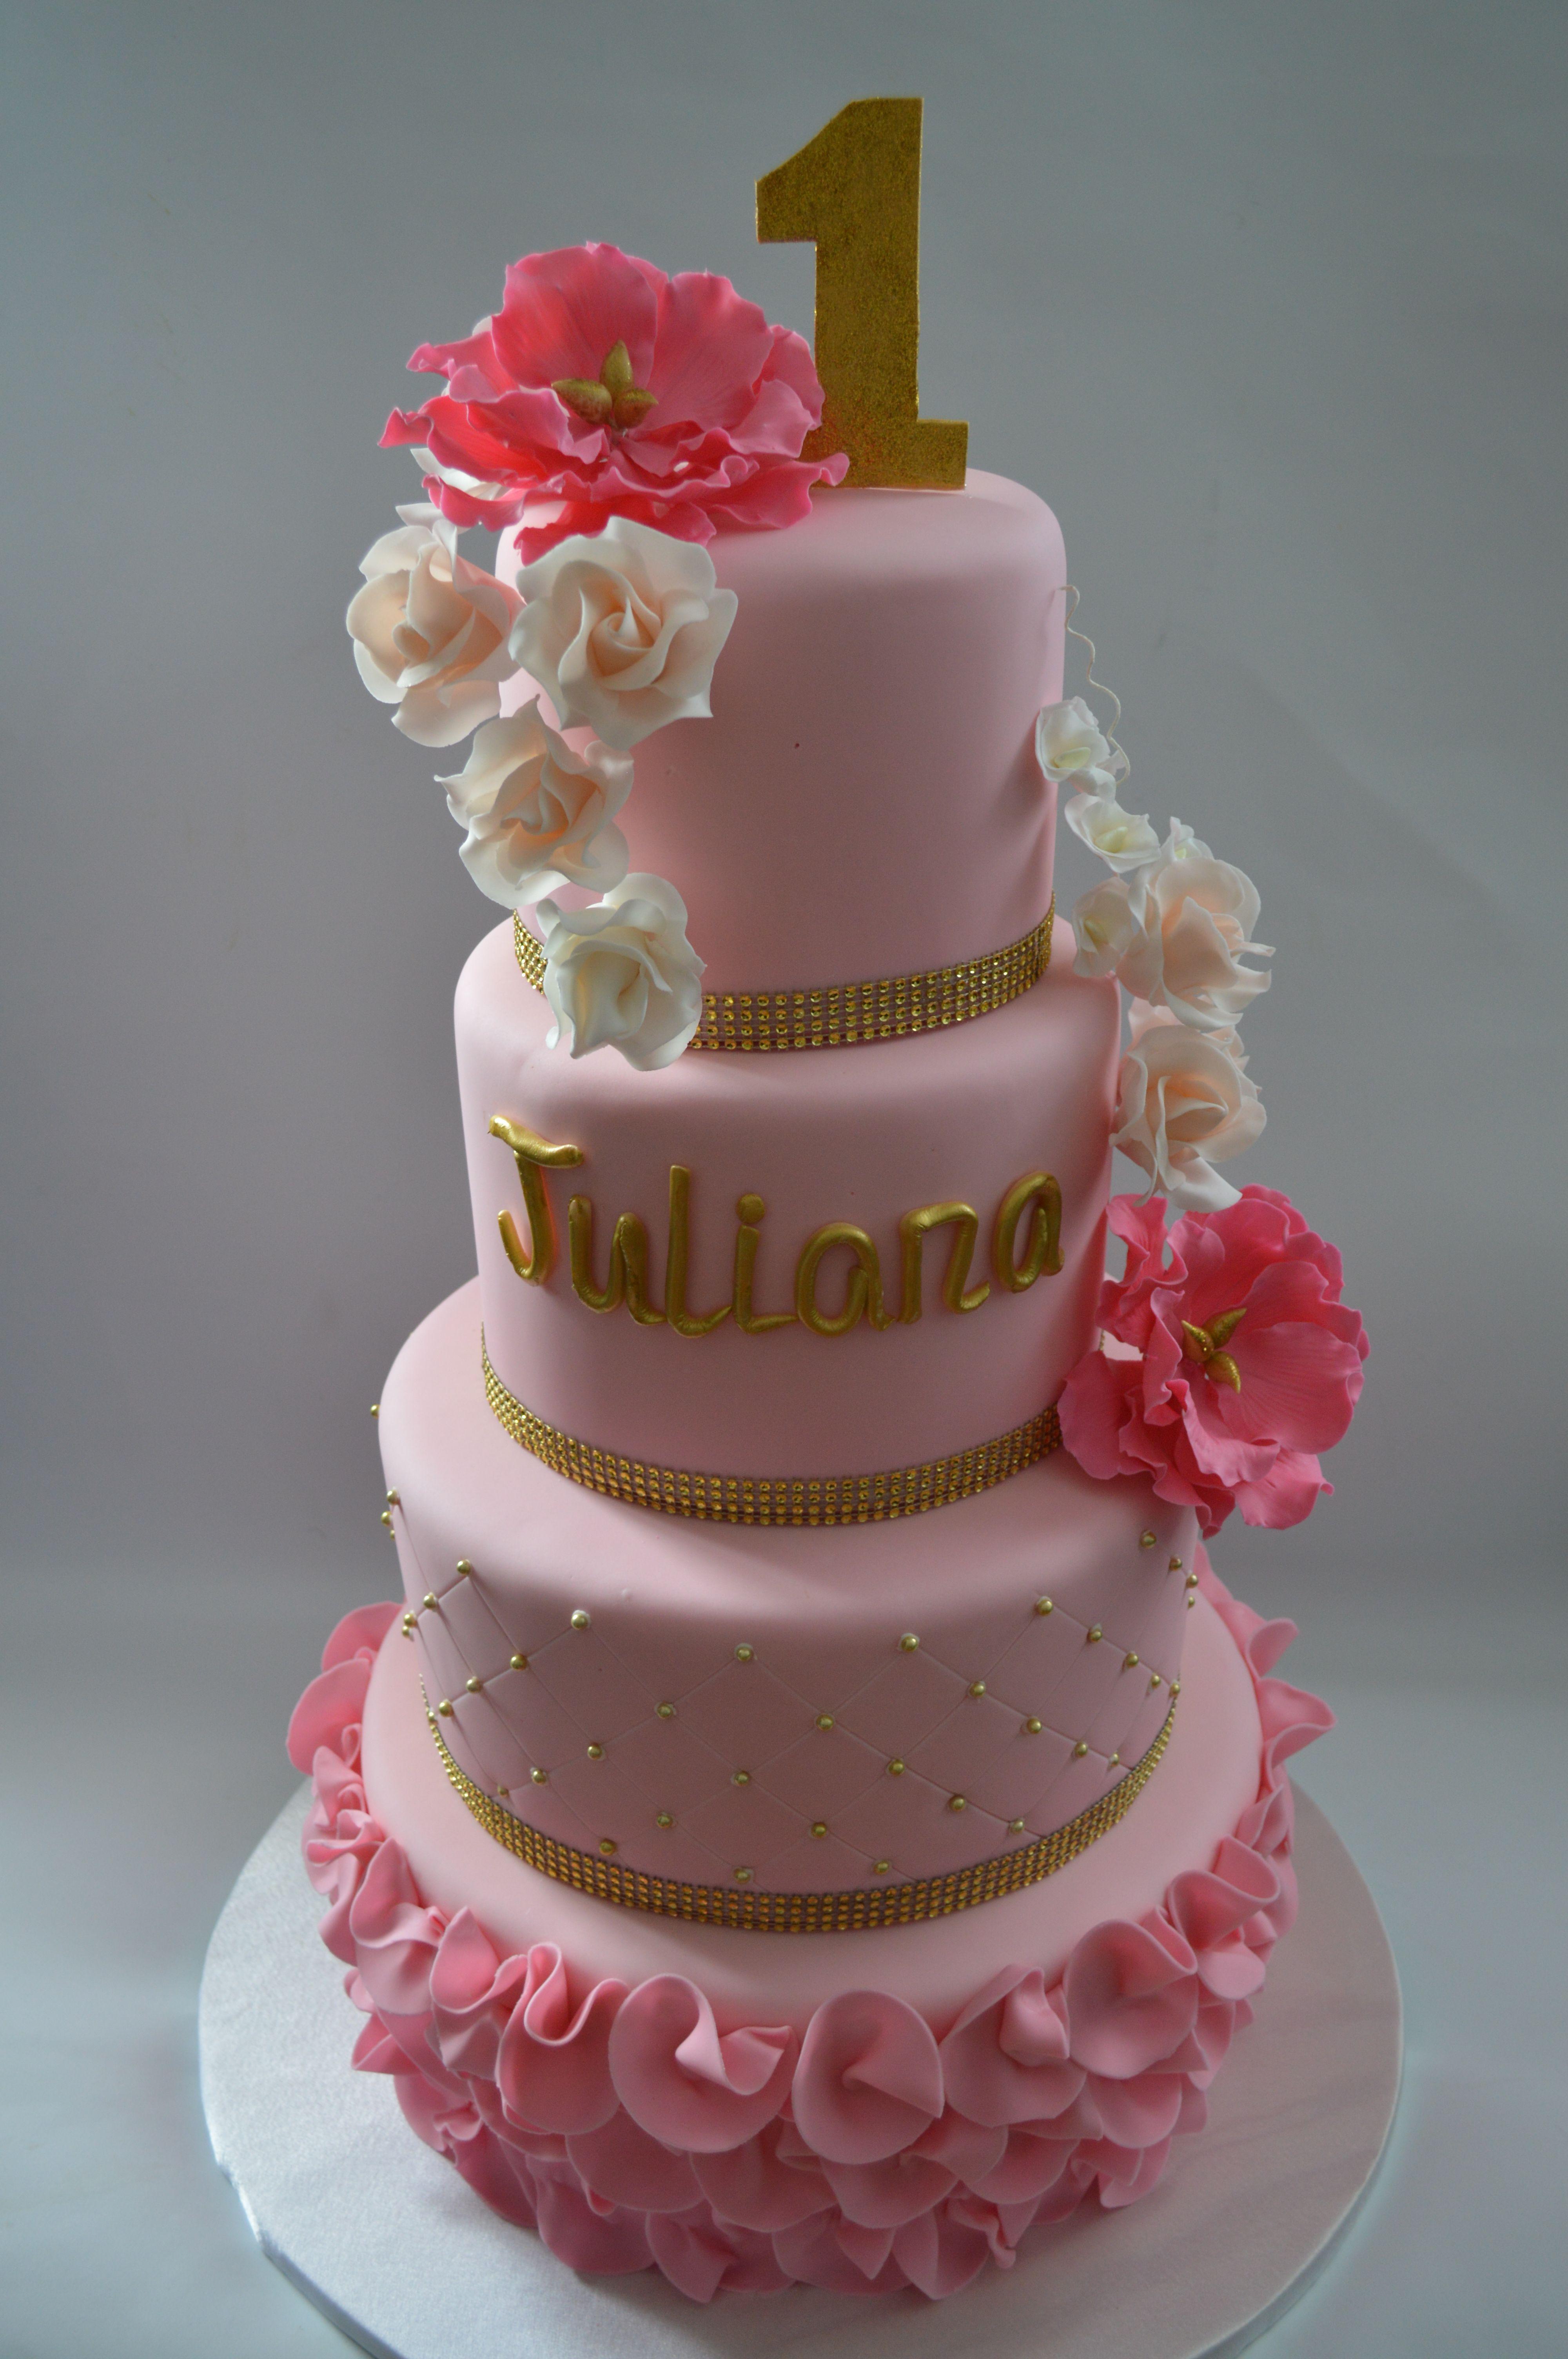 St Birthday Cake Girl My Work Pinterest Cake Girls - 1st girl birthday cake